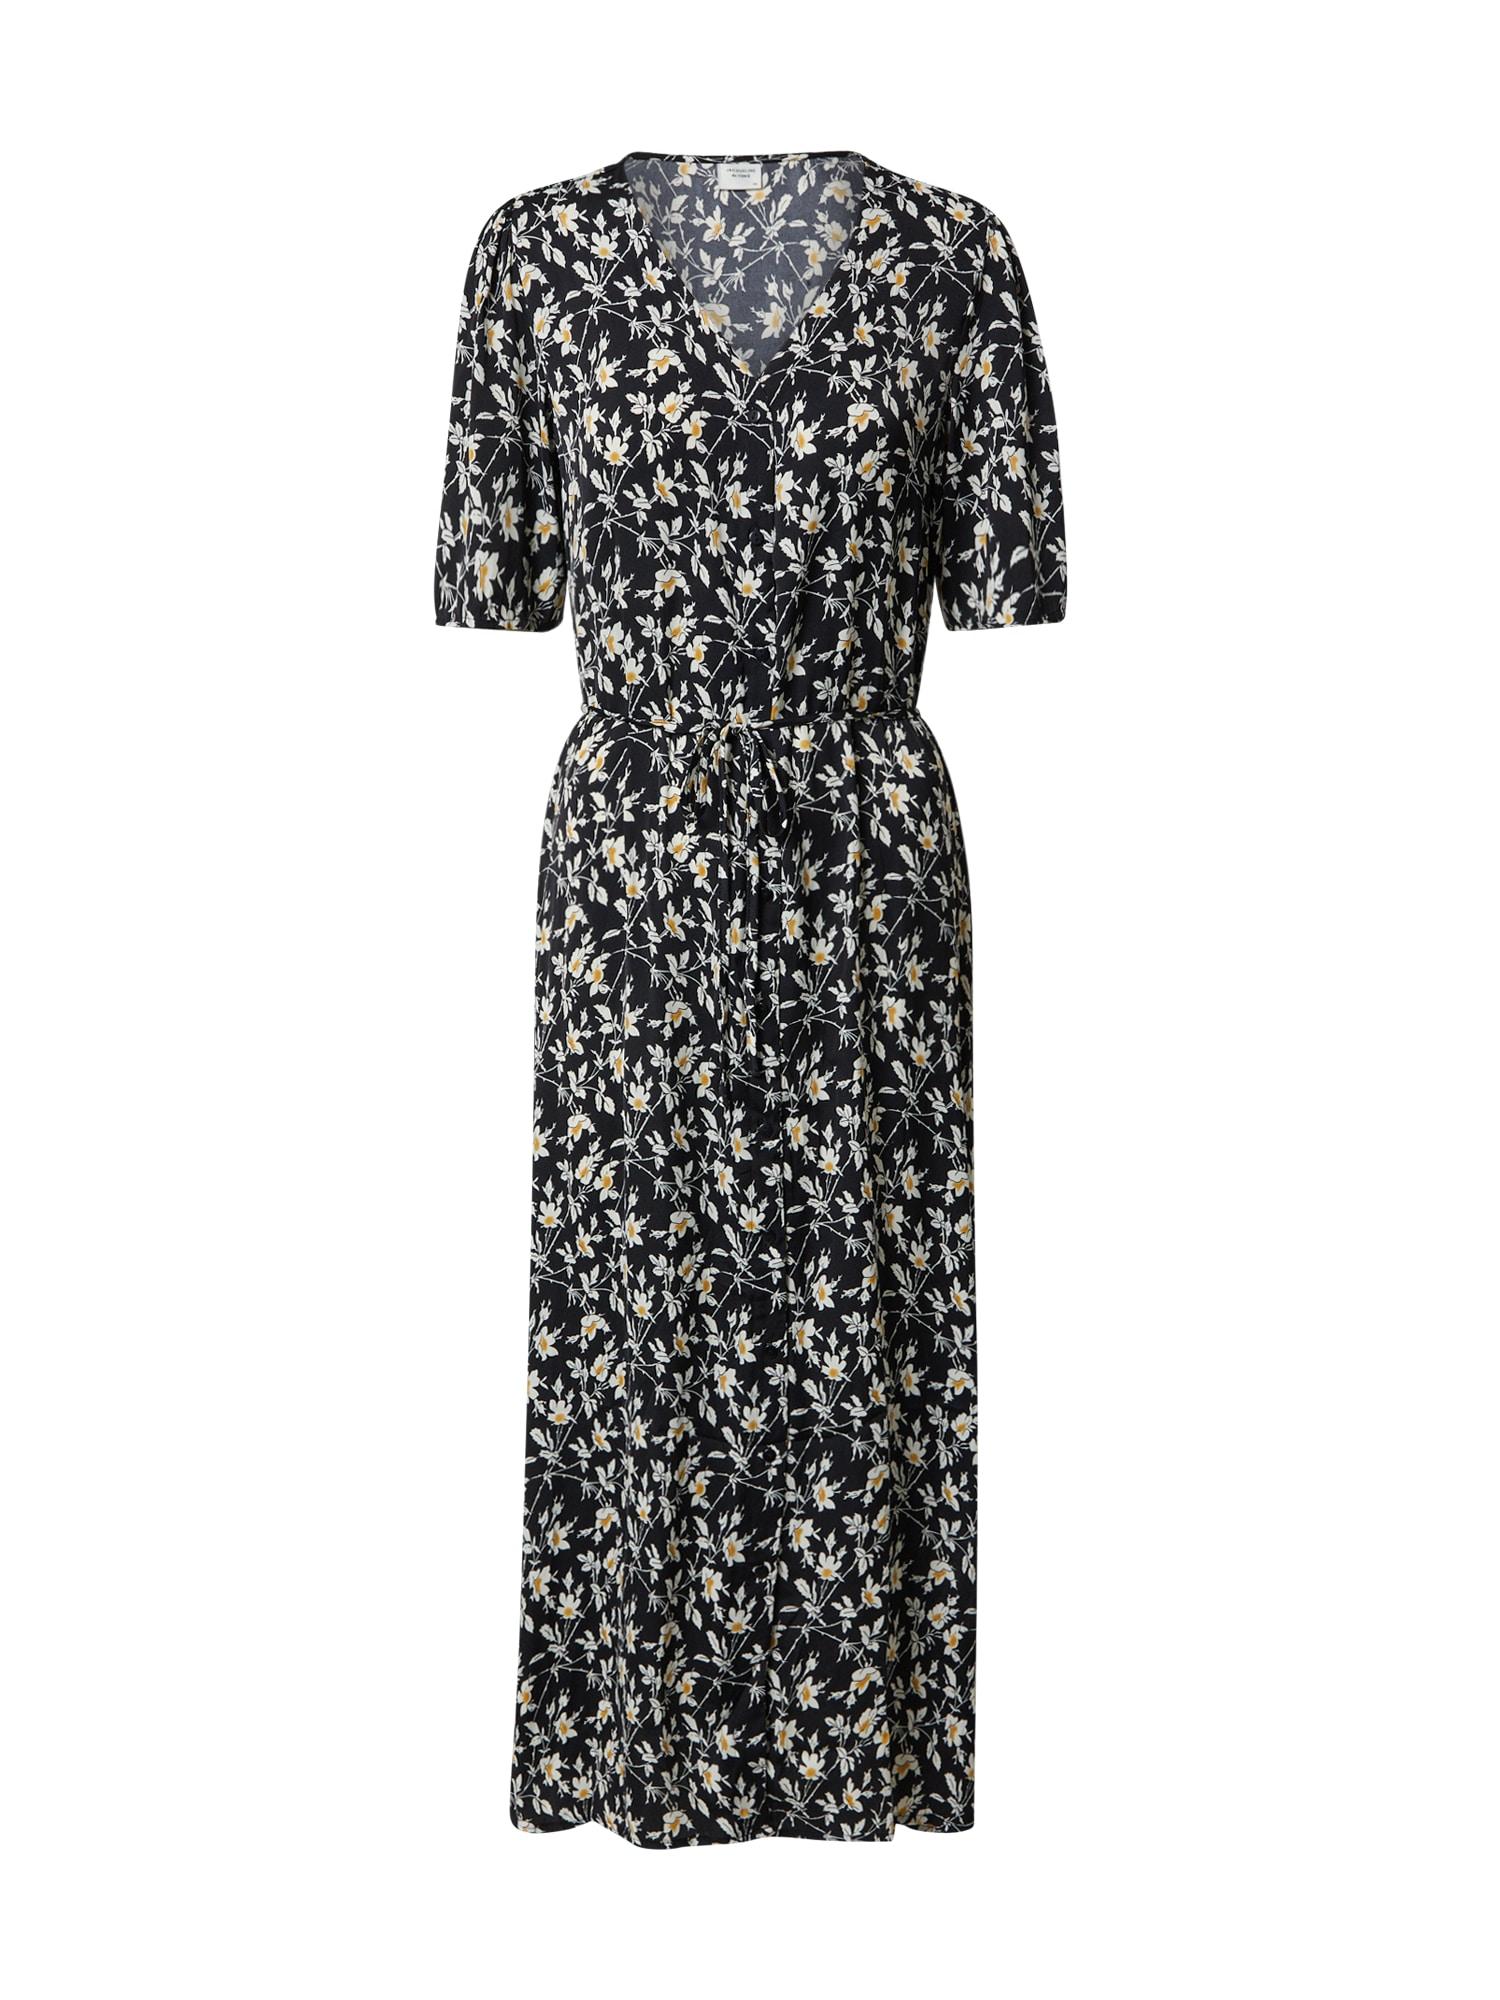 JACQUELINE de YONG Suknelė geltona / balta / juoda